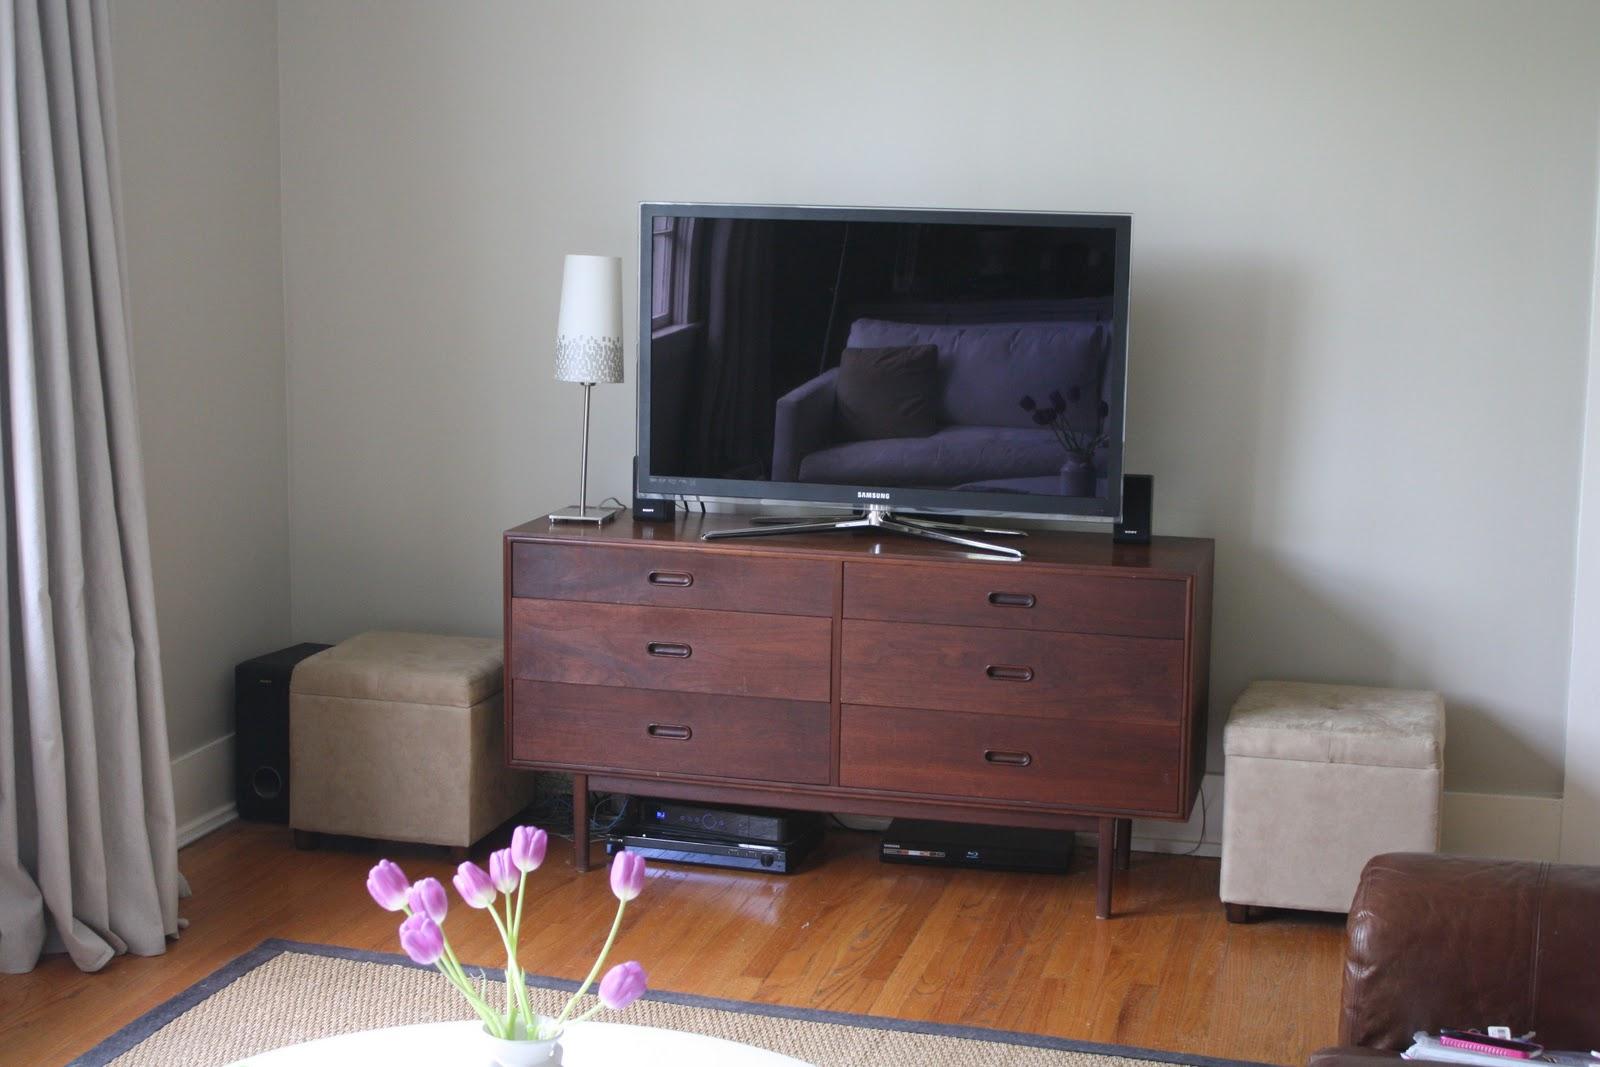 dwell and tell Living Room Progress  Dresser for TV